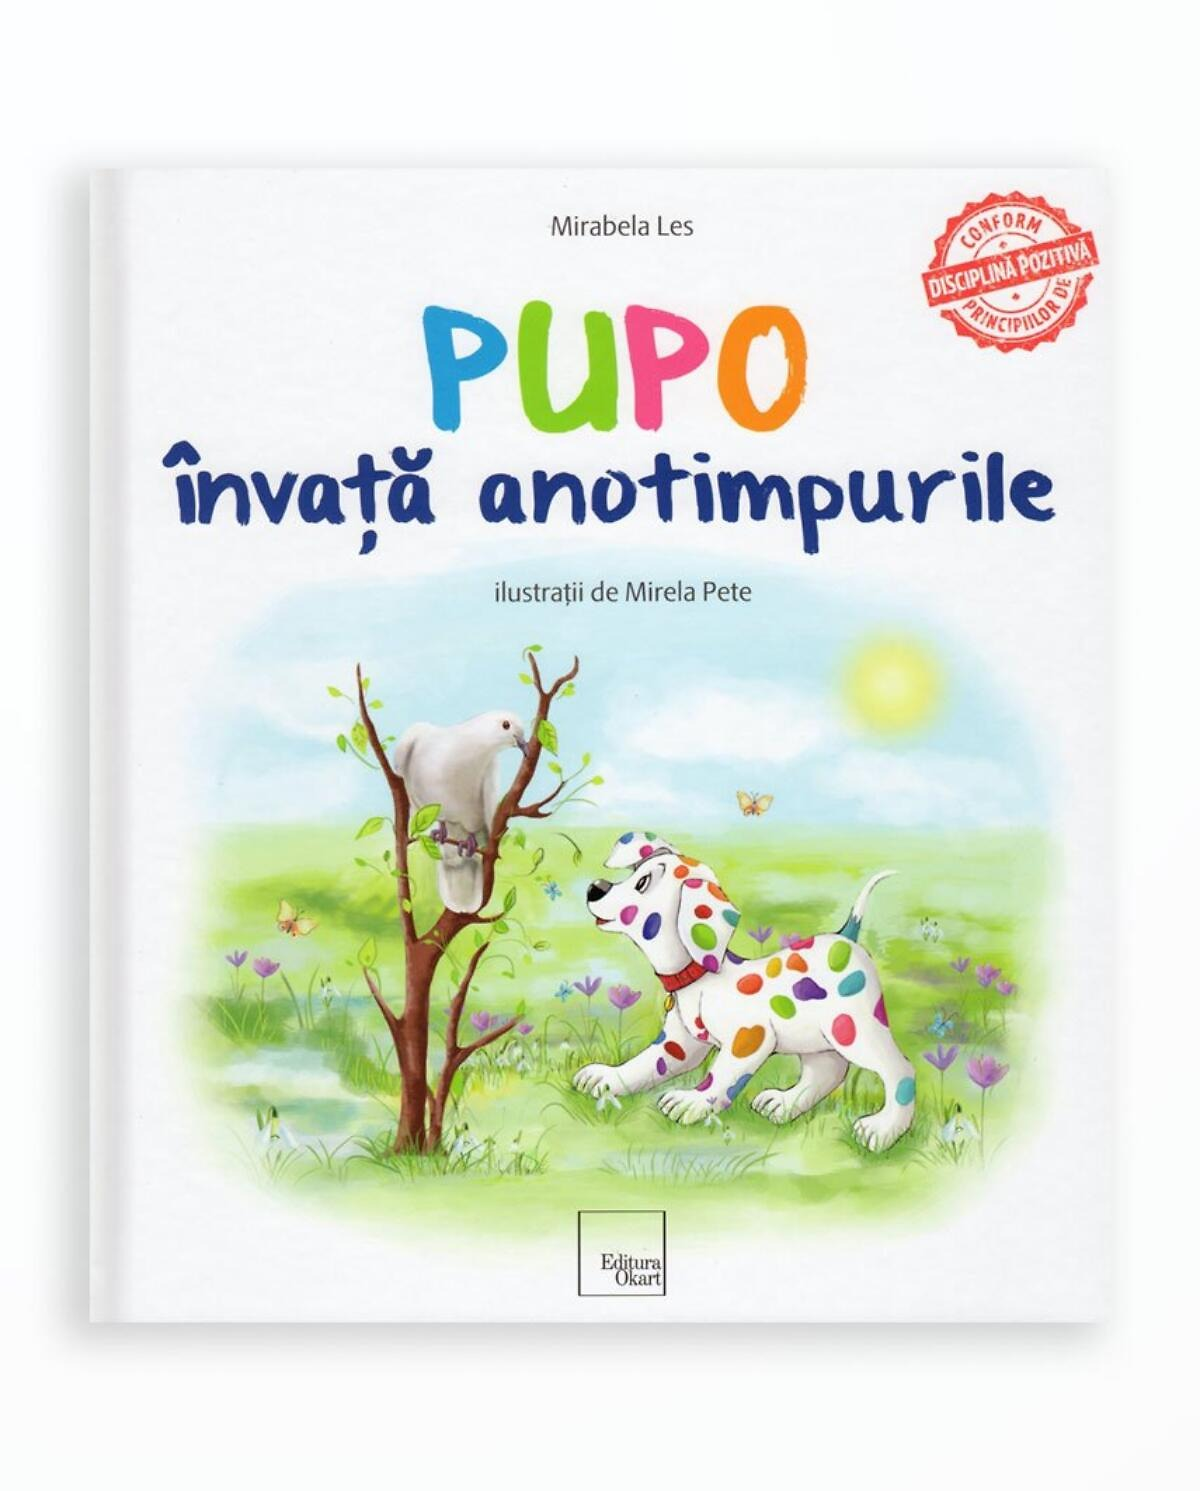 PUPO INVATA ANOTIMPURILE